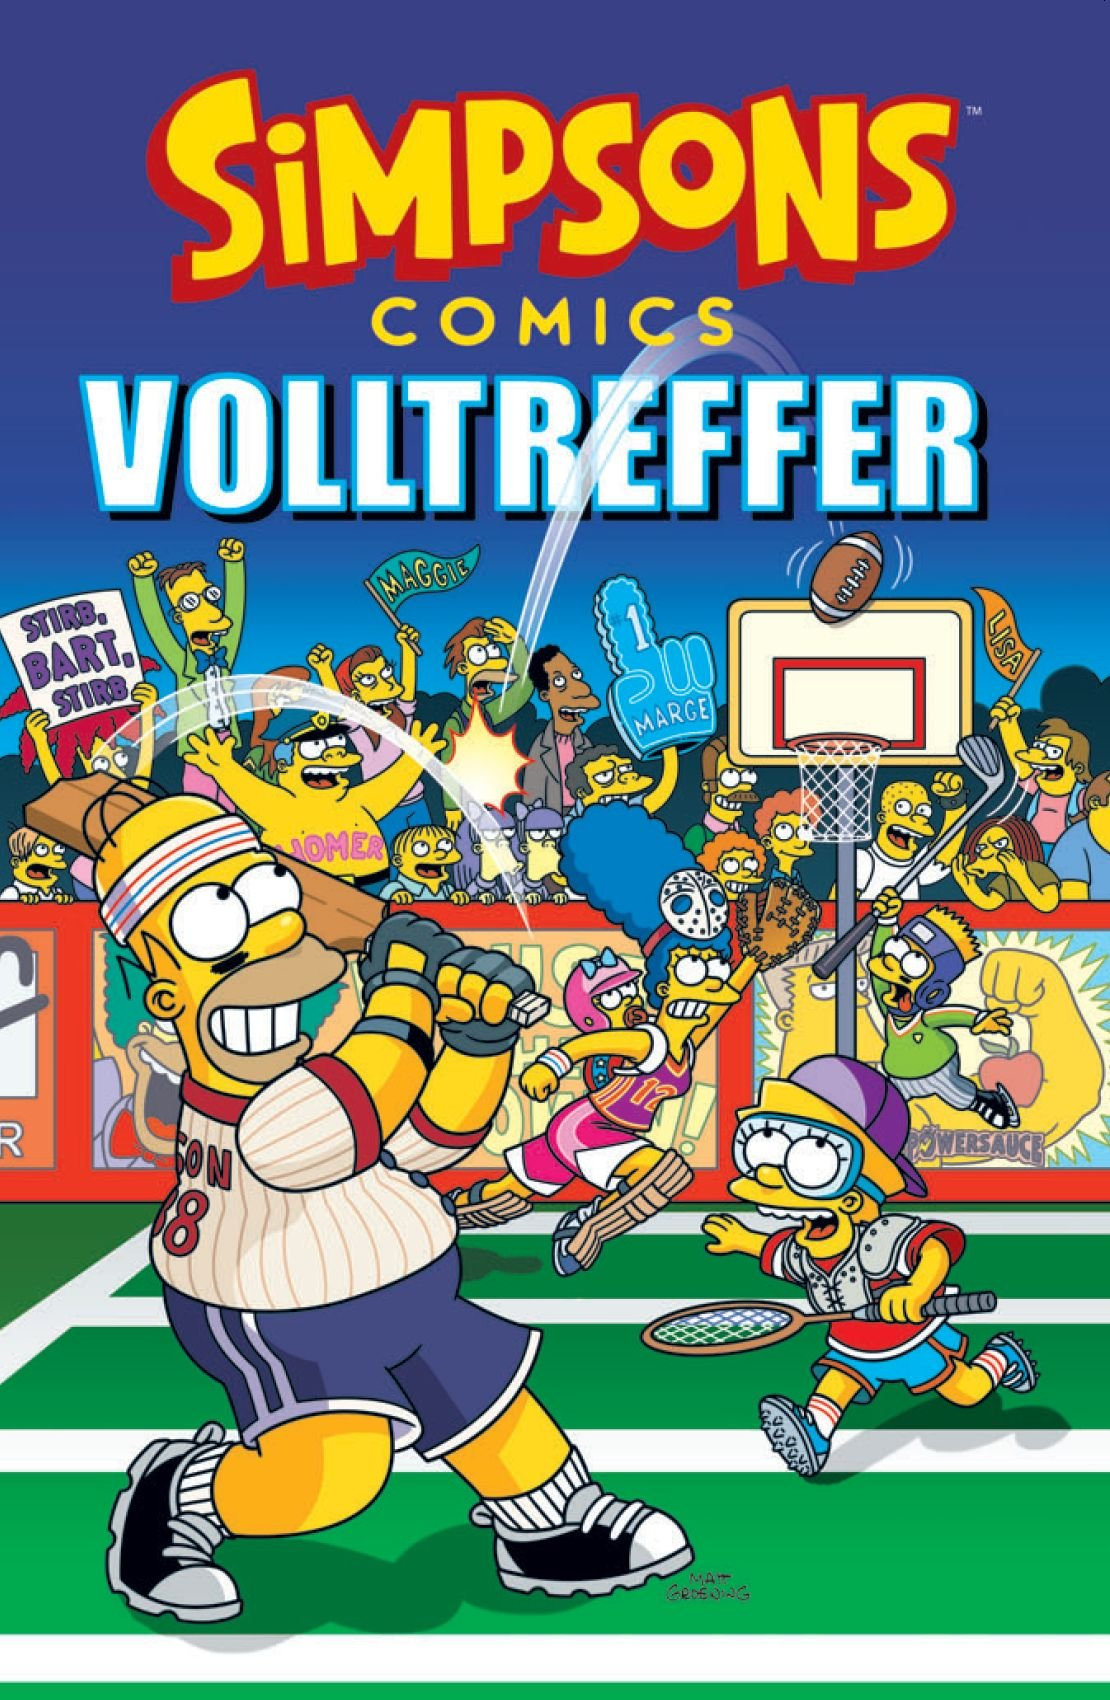 Simpsons Comics: Bd. 27: Volltreffer Taschenbuch – 25. Juni 2018 Matt Groening Bill Morrison Matthias Wieland Panini